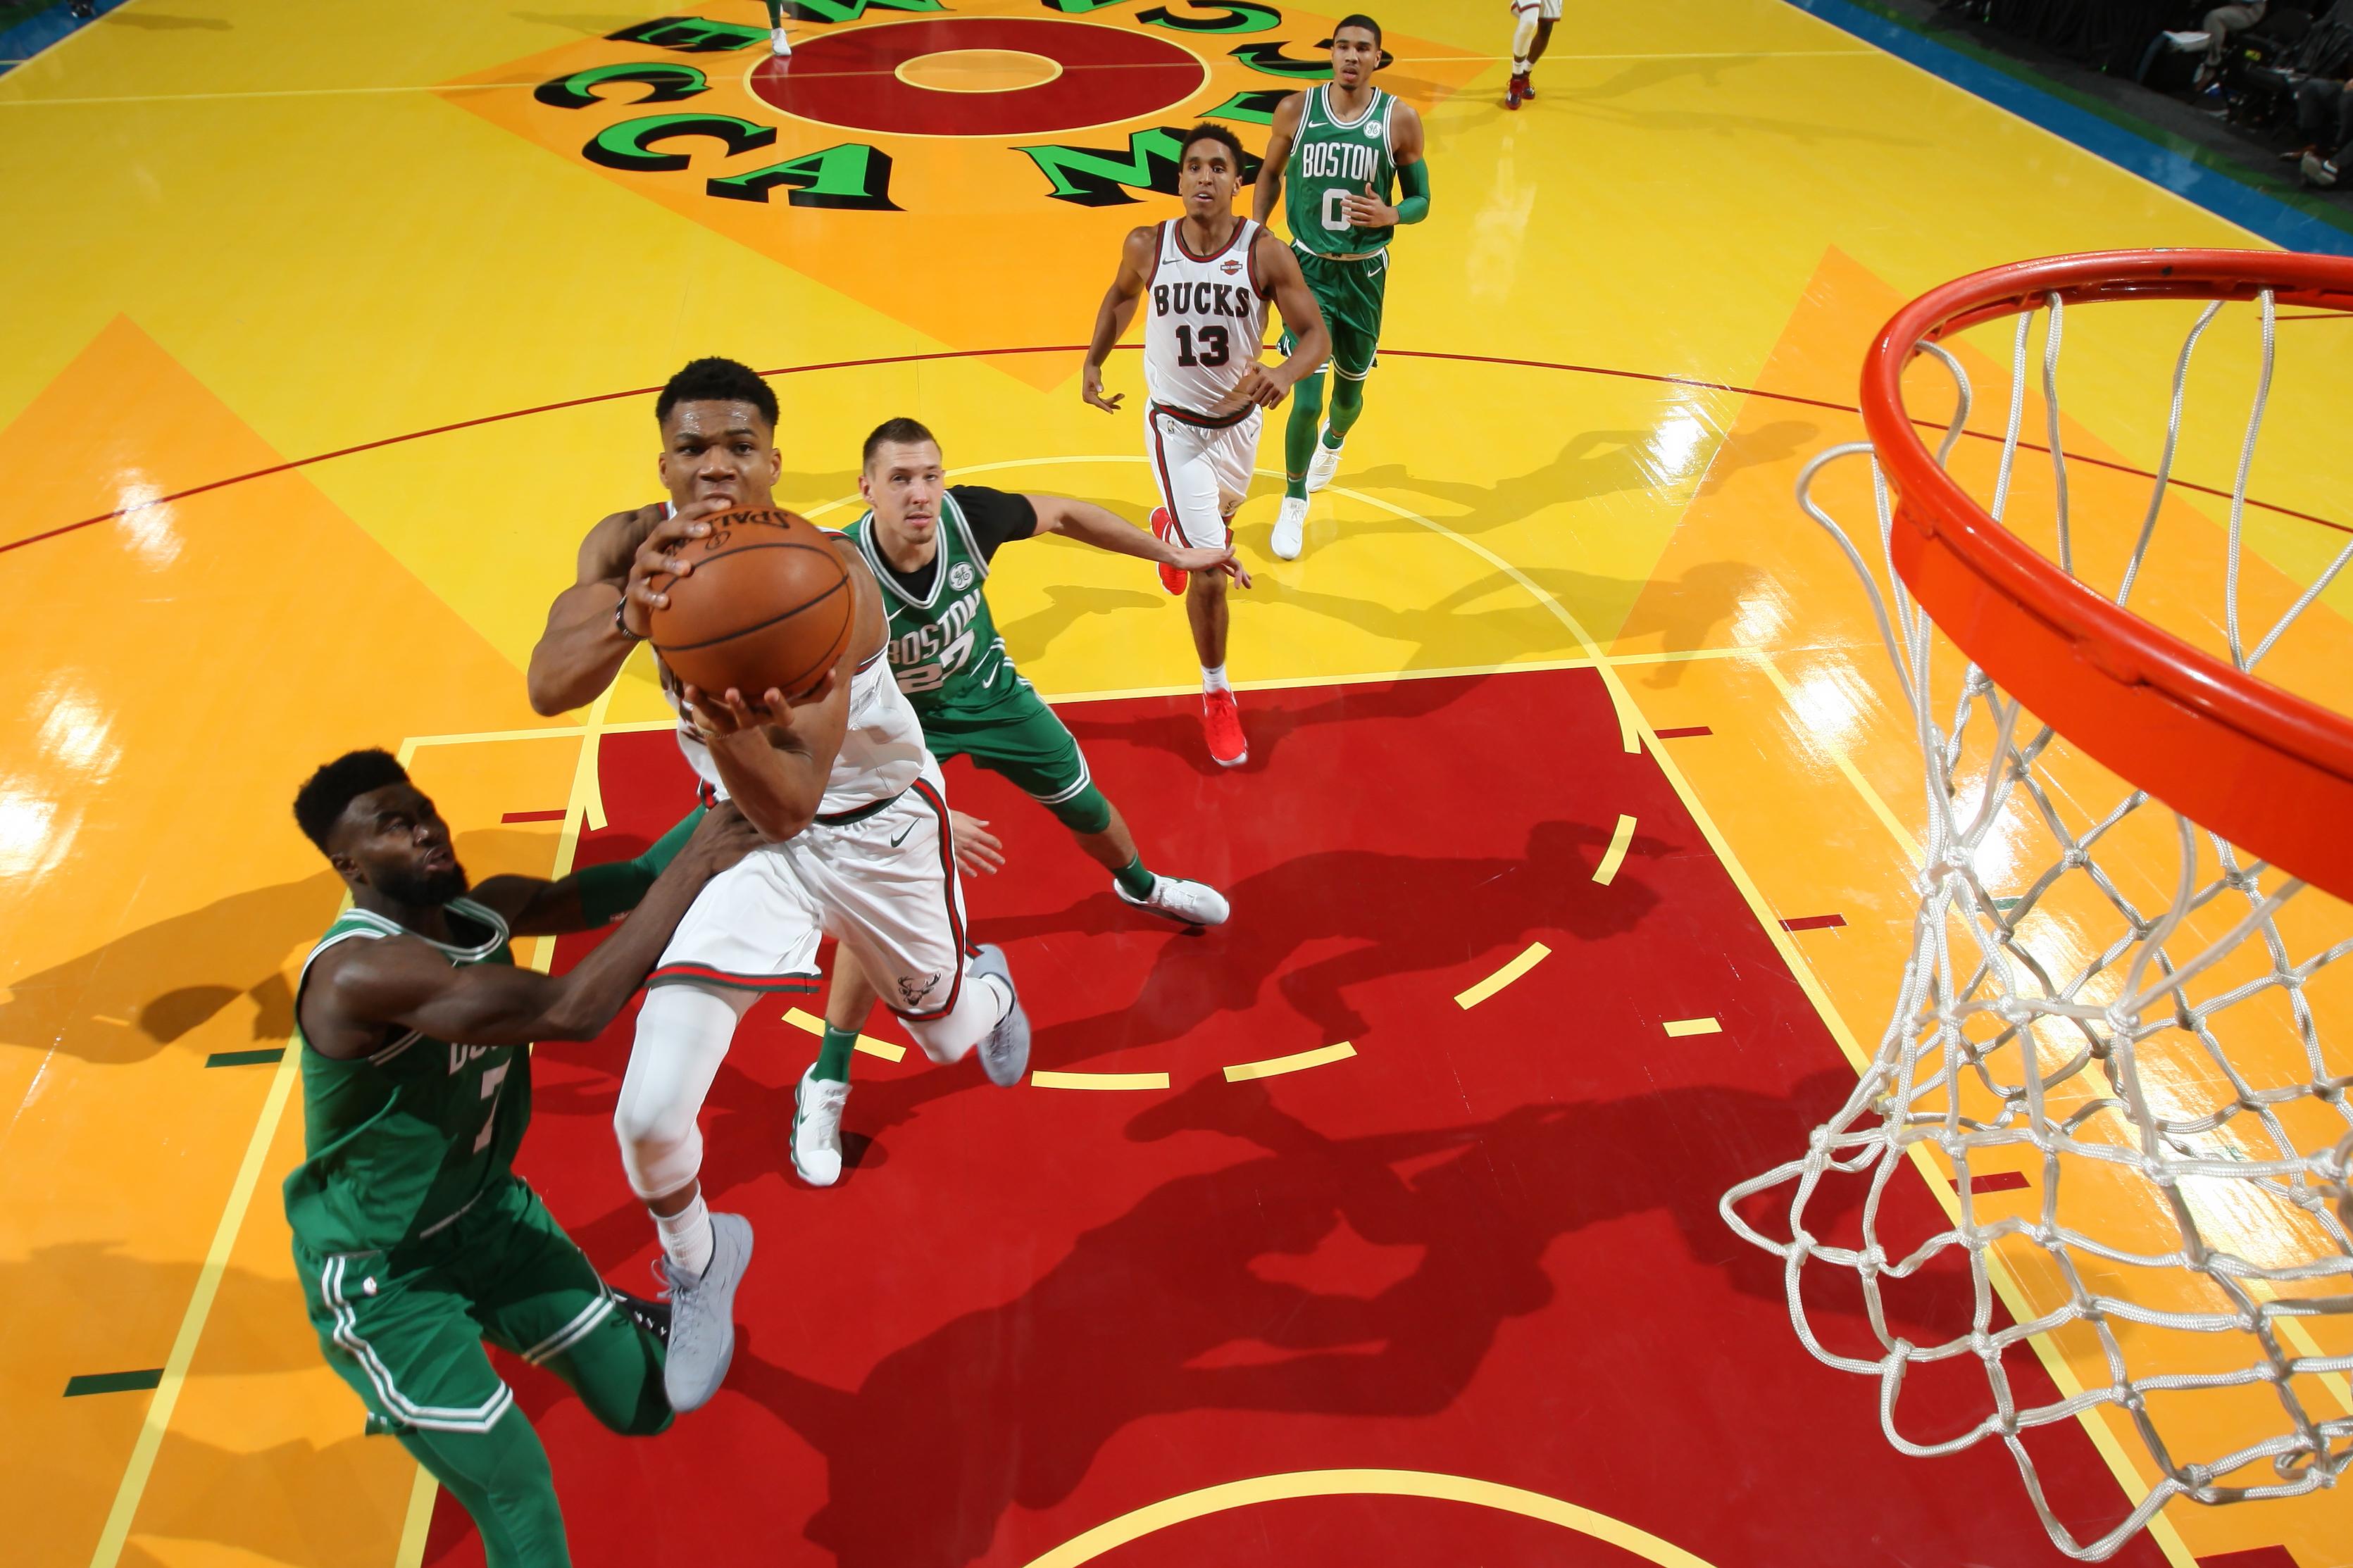 Celtics beat Bucks 111-100 despite monster night from Antetokounmpo